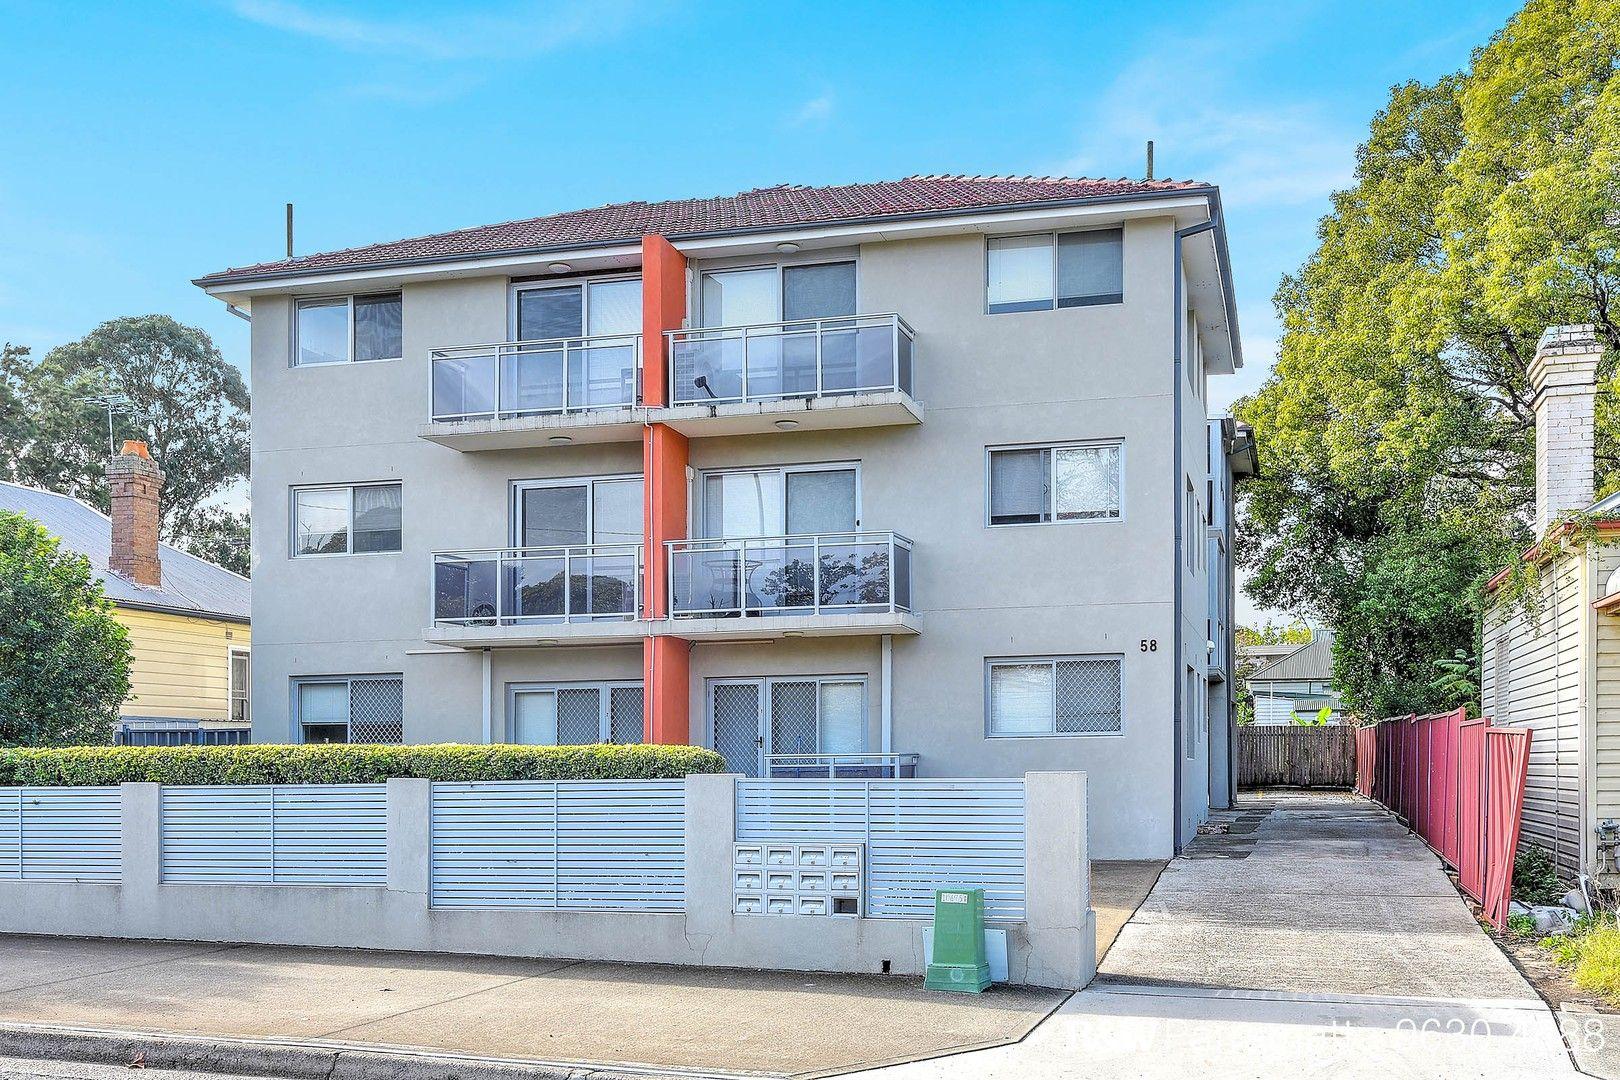 10/58 O'Connell Street, Parramatta NSW 2150, Image 0